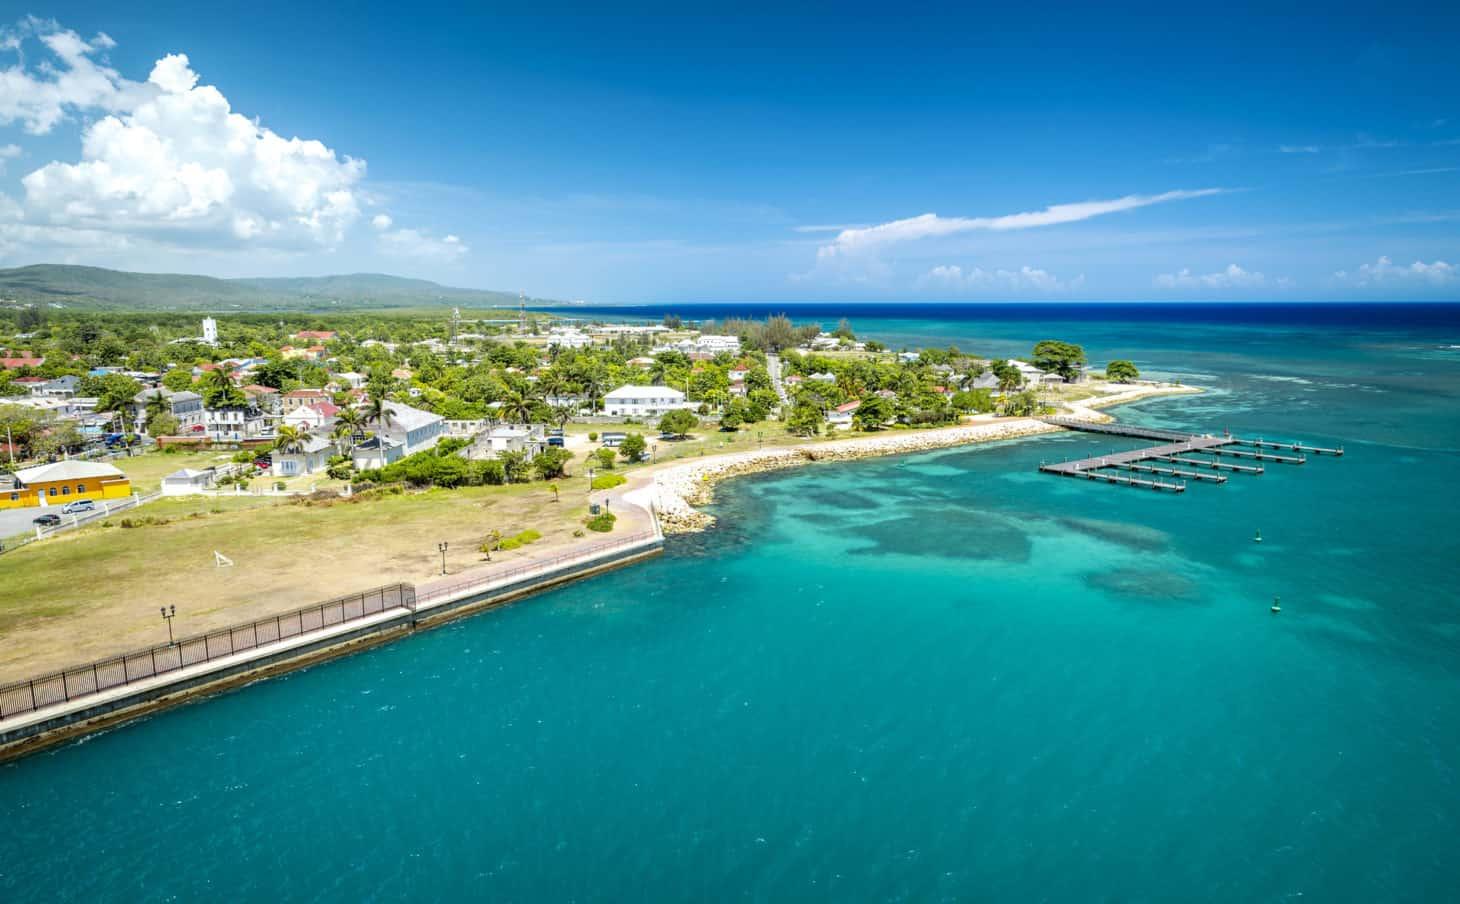 Stranden in Jamaica